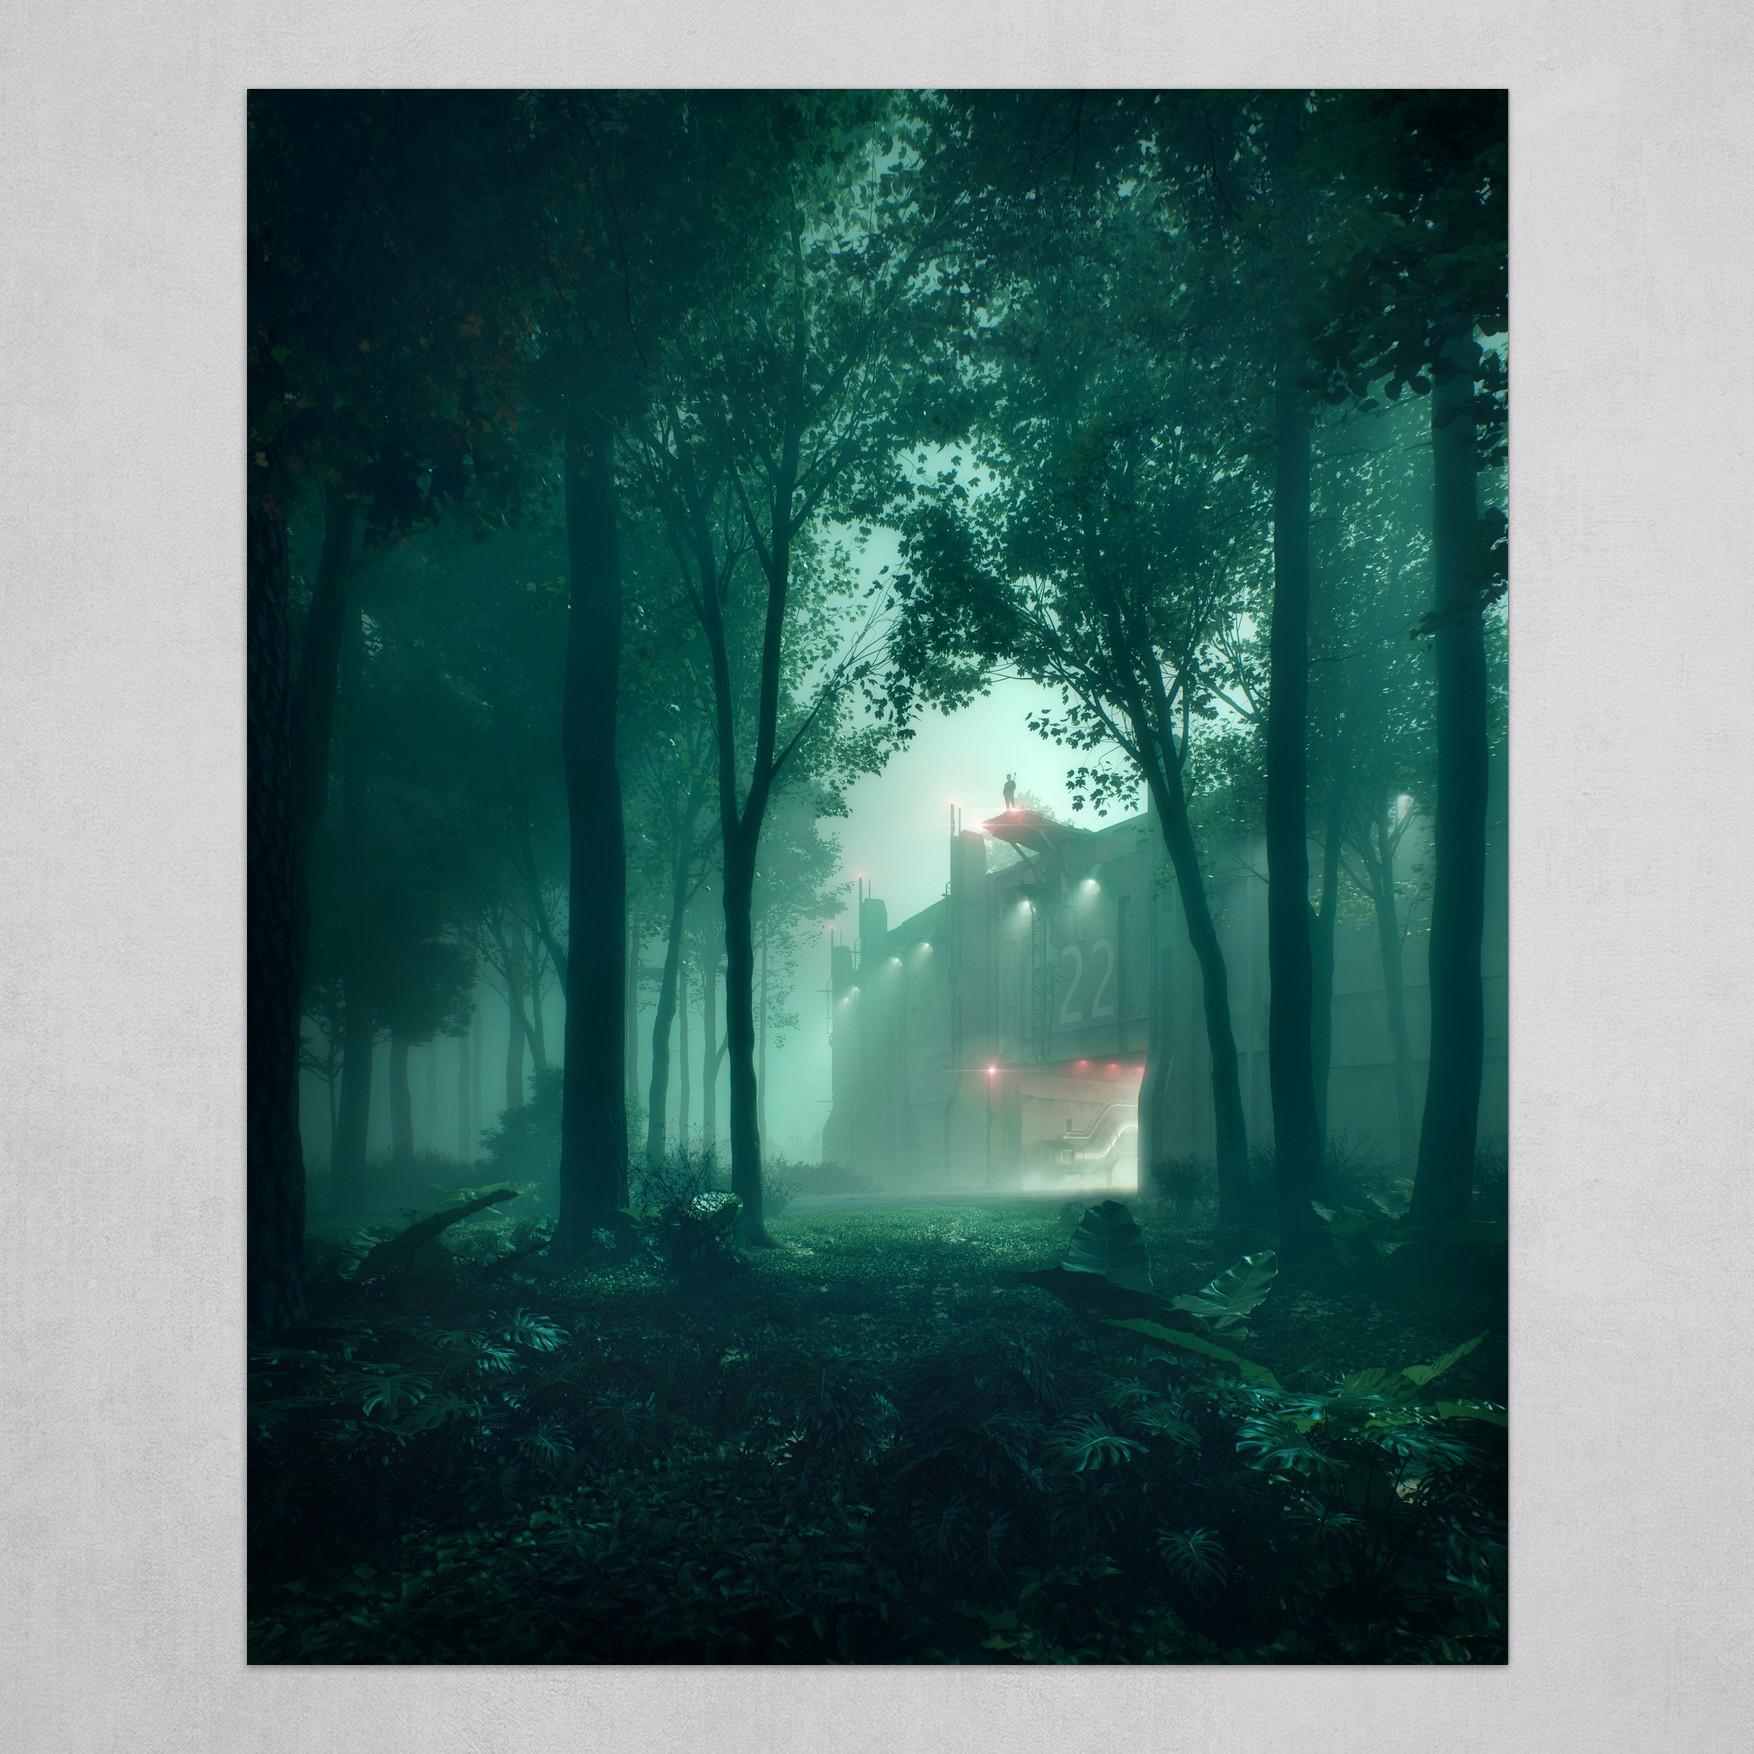 Project 22: The Secret Garden